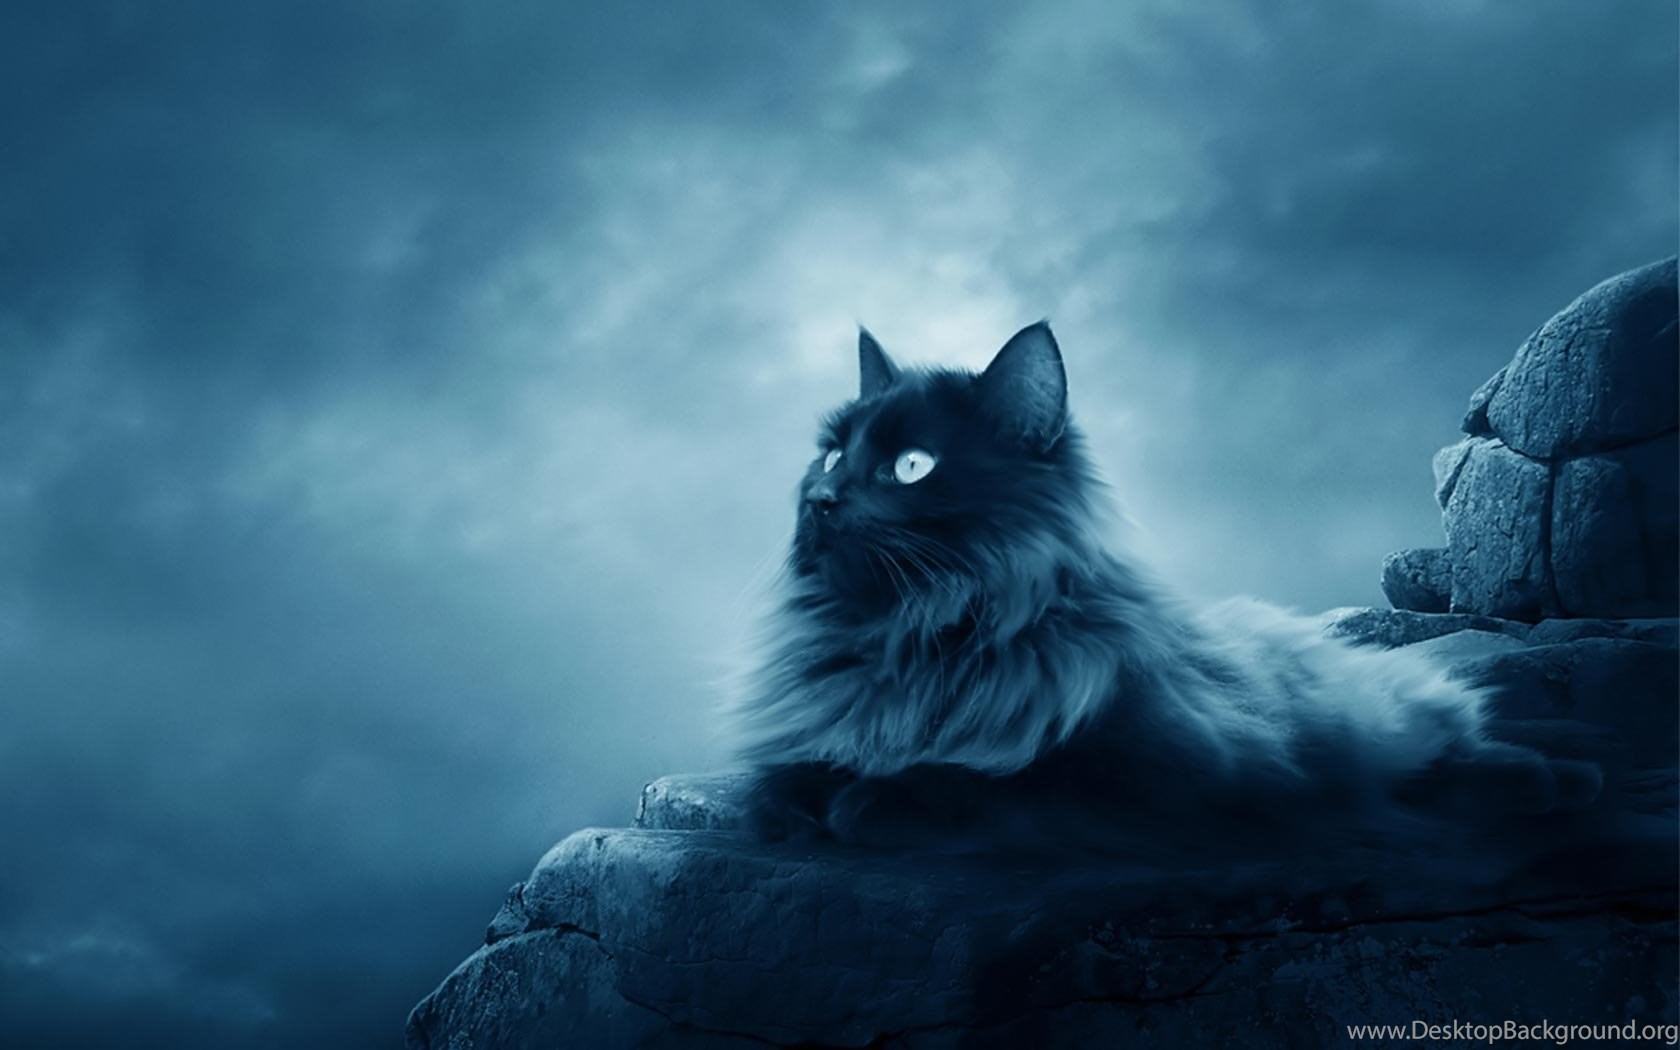 Cool Cat Hd Wallpapers Desktop Background